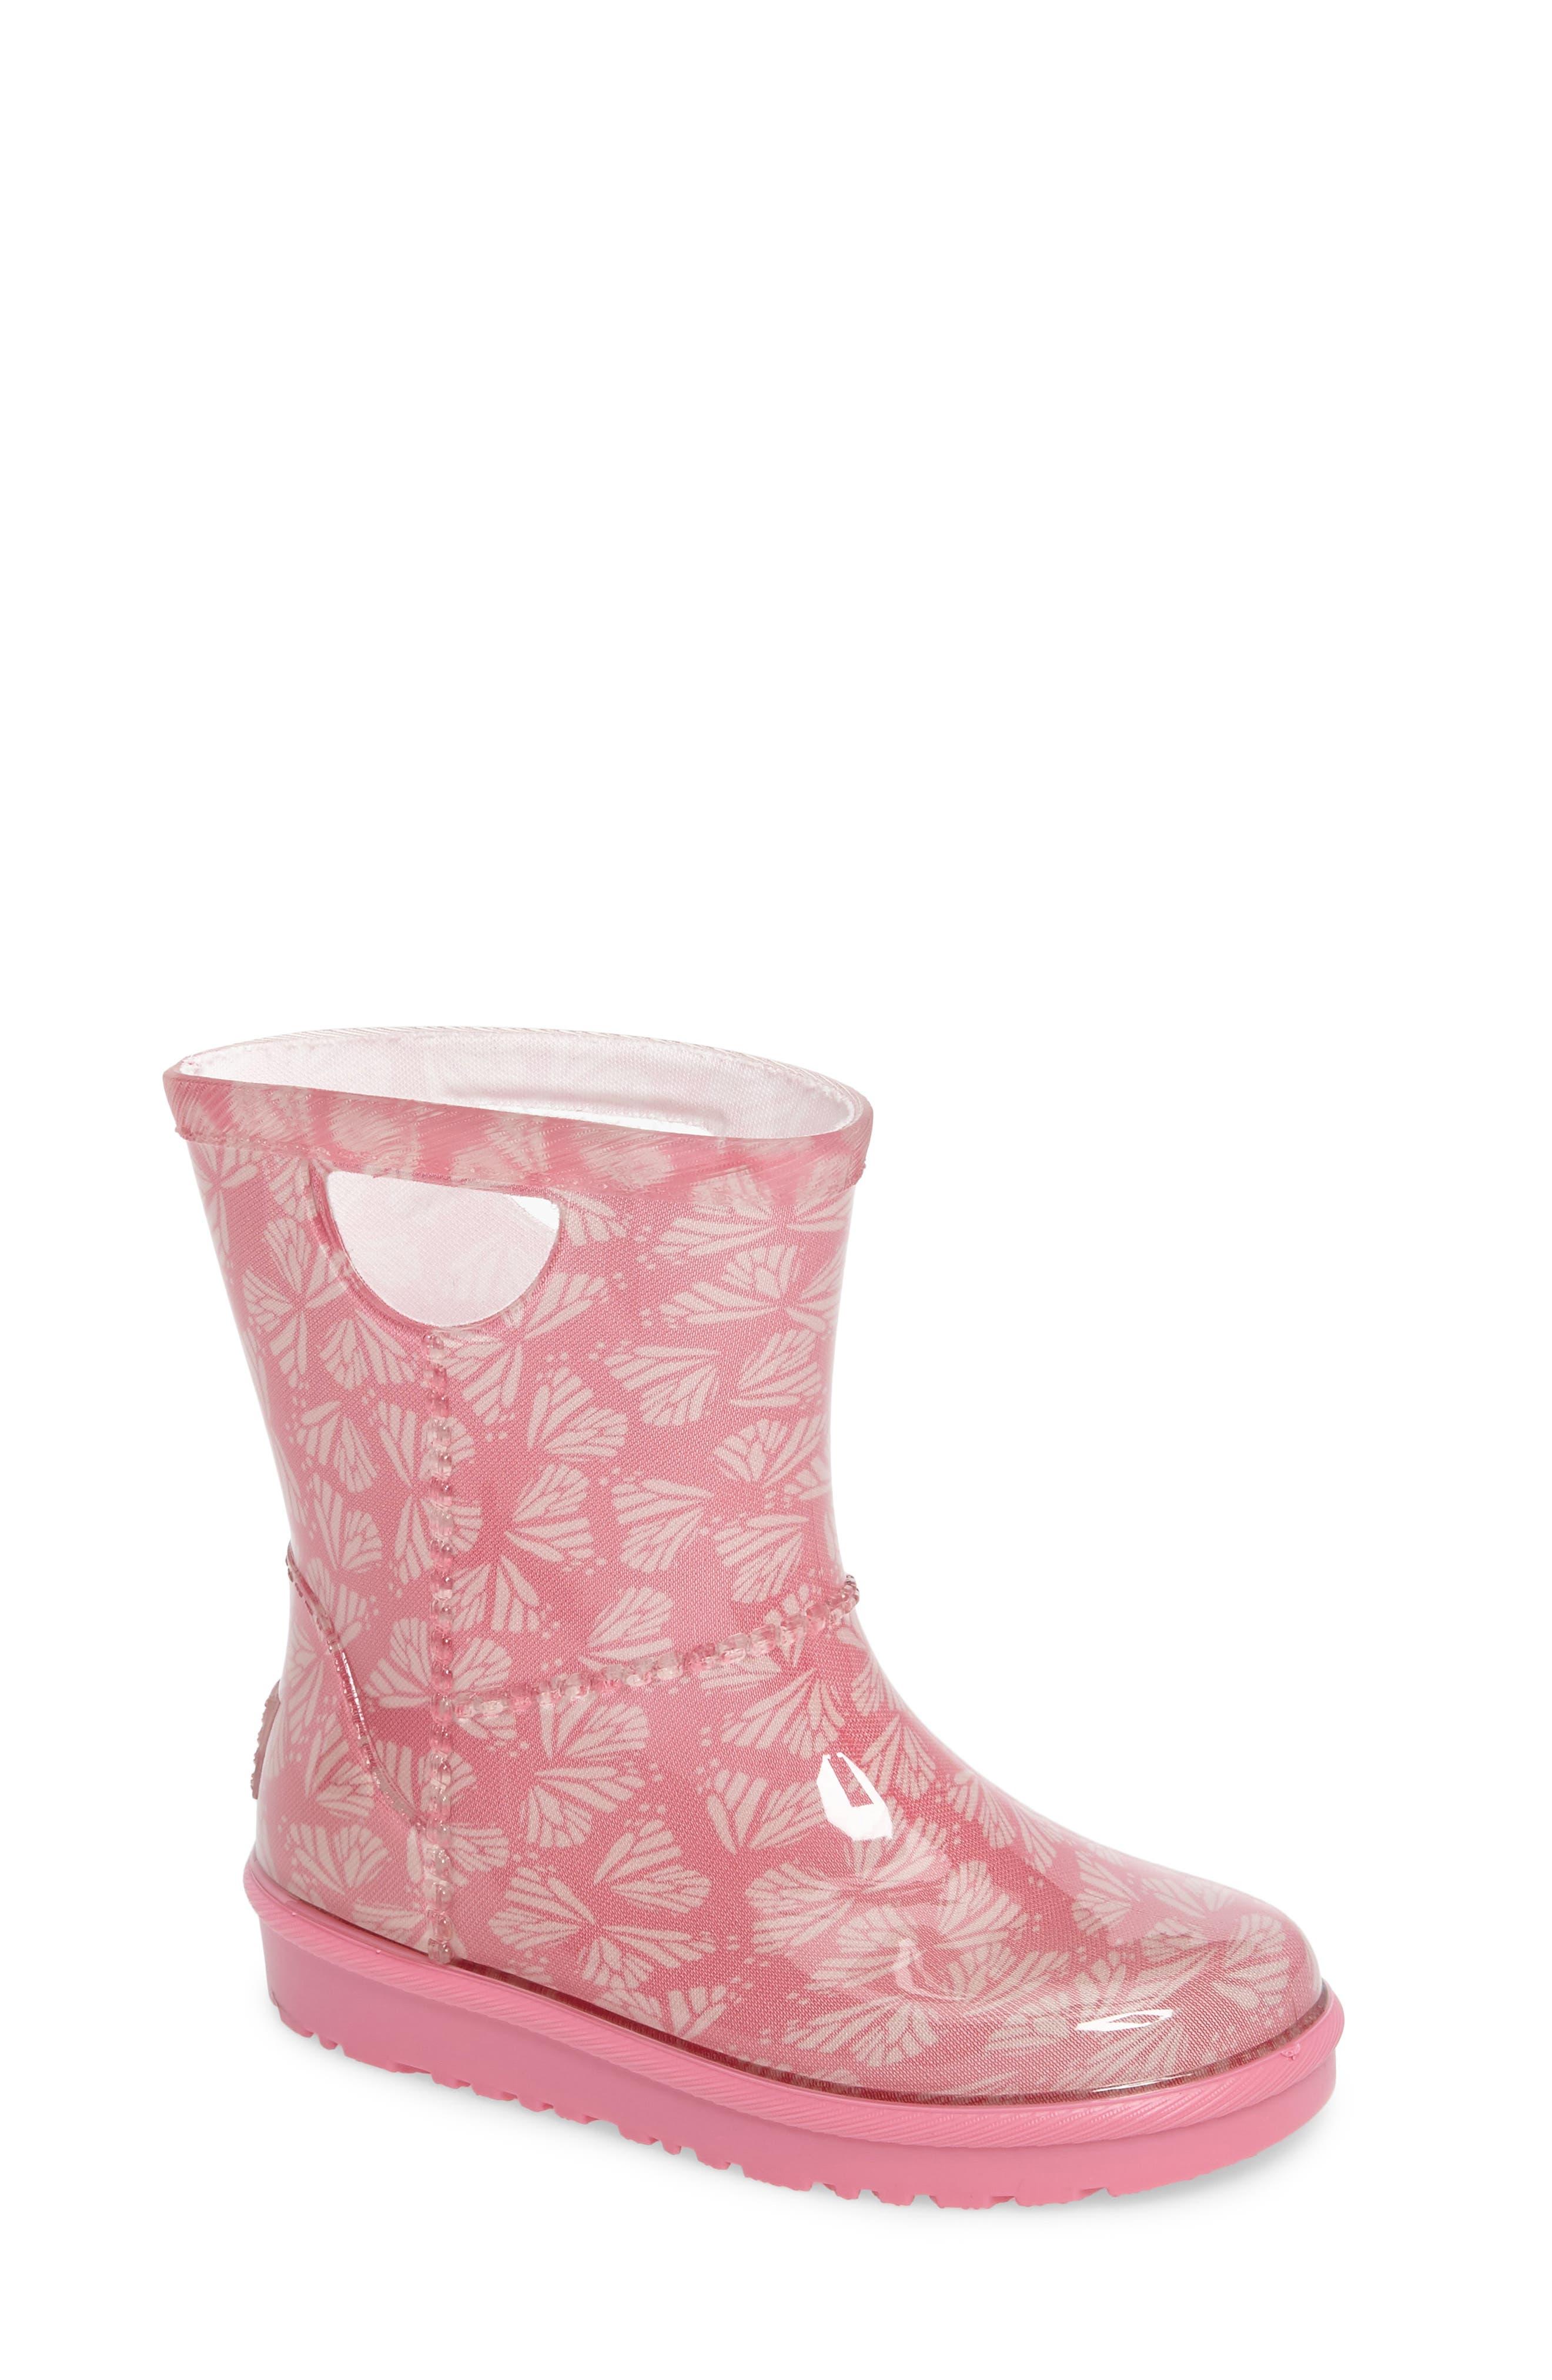 Rahjee Rain Boot,                         Main,                         color, Pink Azalea